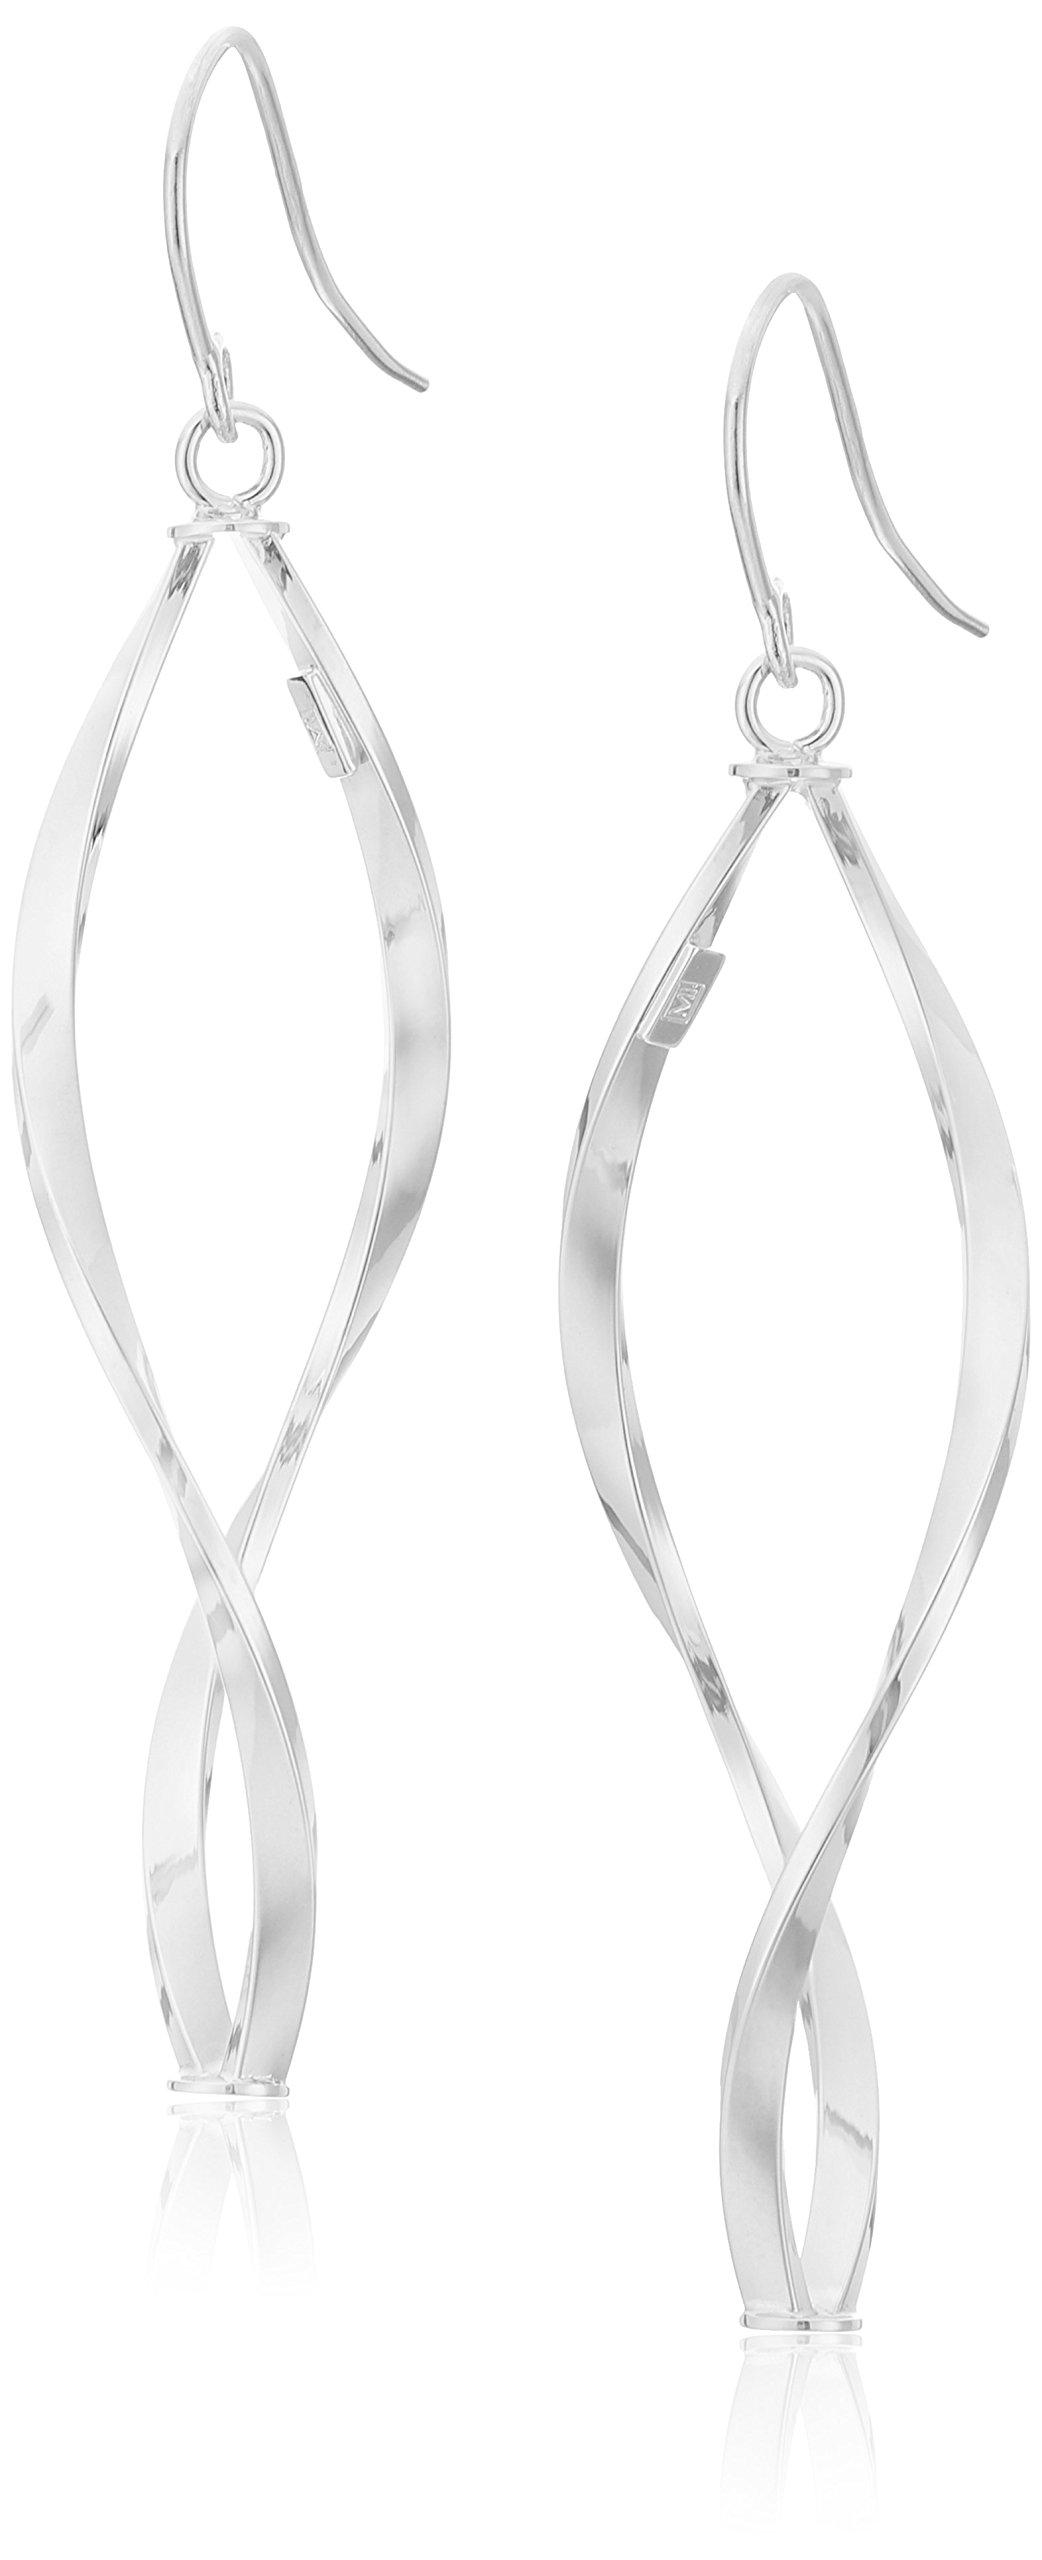 14k Italian White Gold Twisted Tube Dangle Earrings